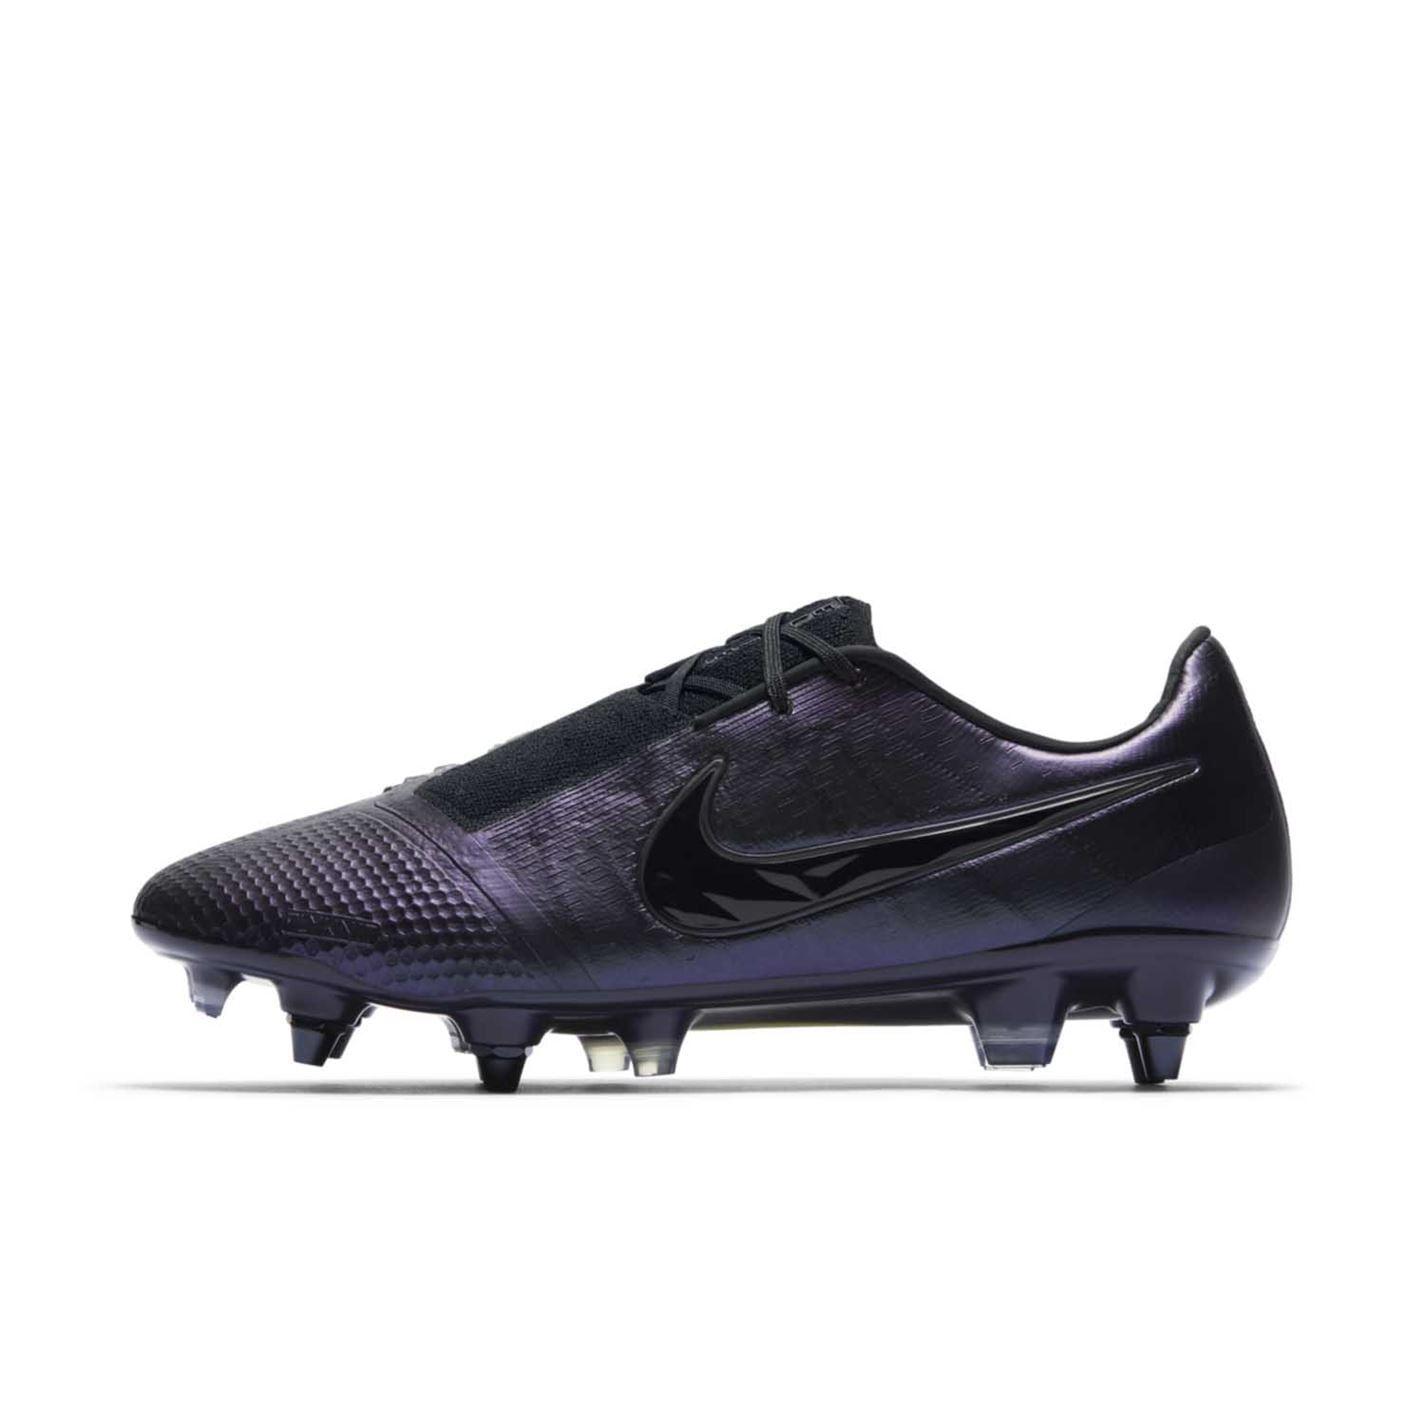 Nike-Phantom-Venom-Elite-Homme-SG-Terrain-Souple-Chaussures-De-Football-Chaussures-de-foot-crampons miniature 7